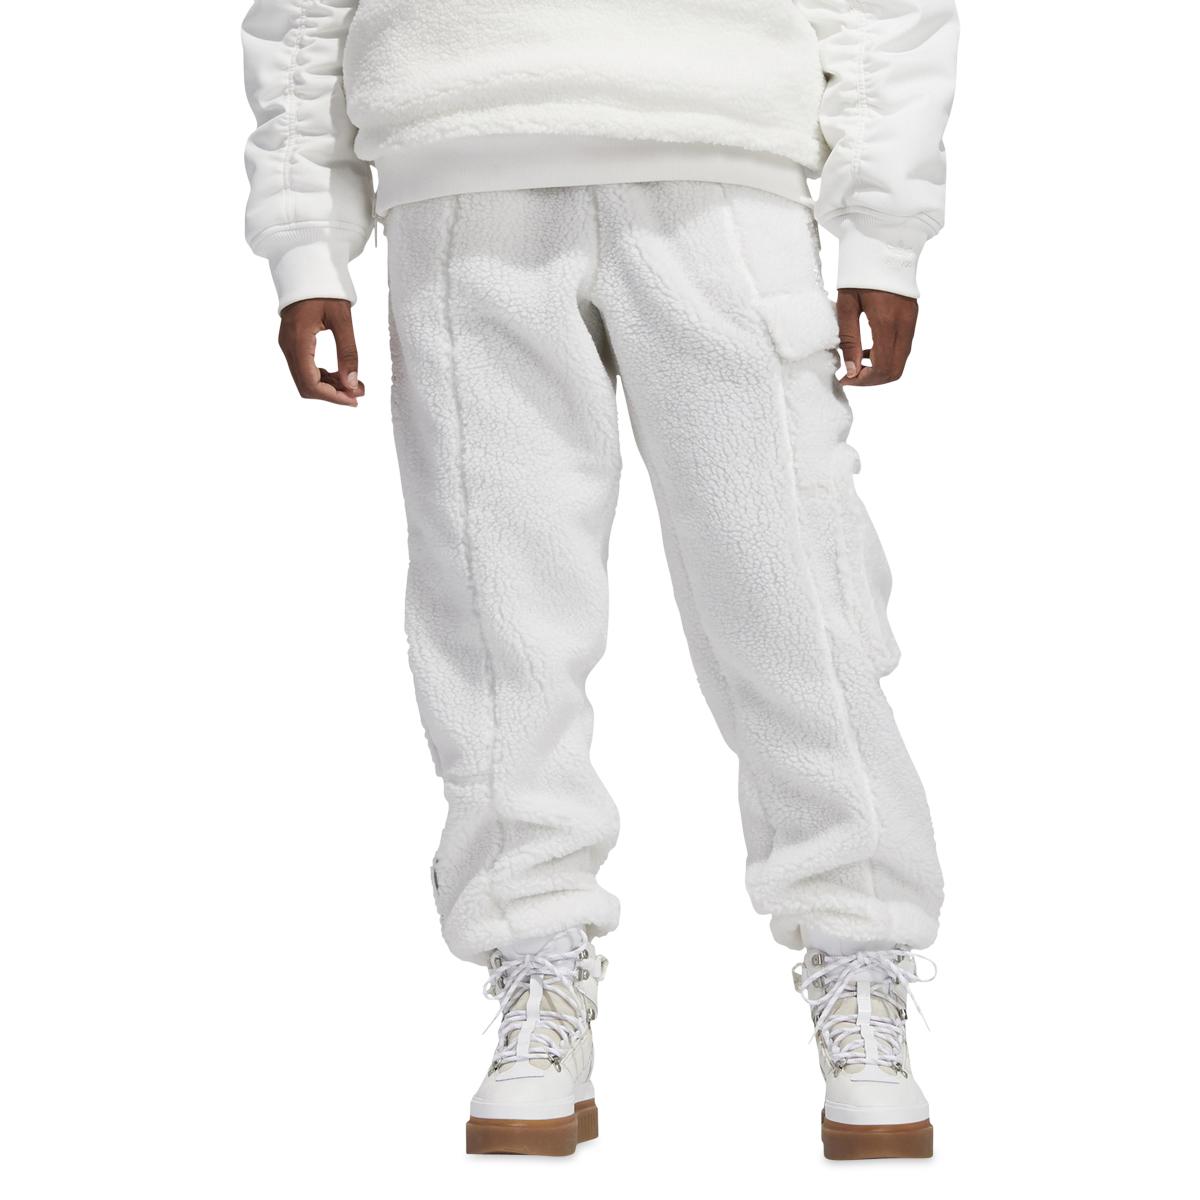 adidas IVY PARK Teddy Cargo Sweatpant